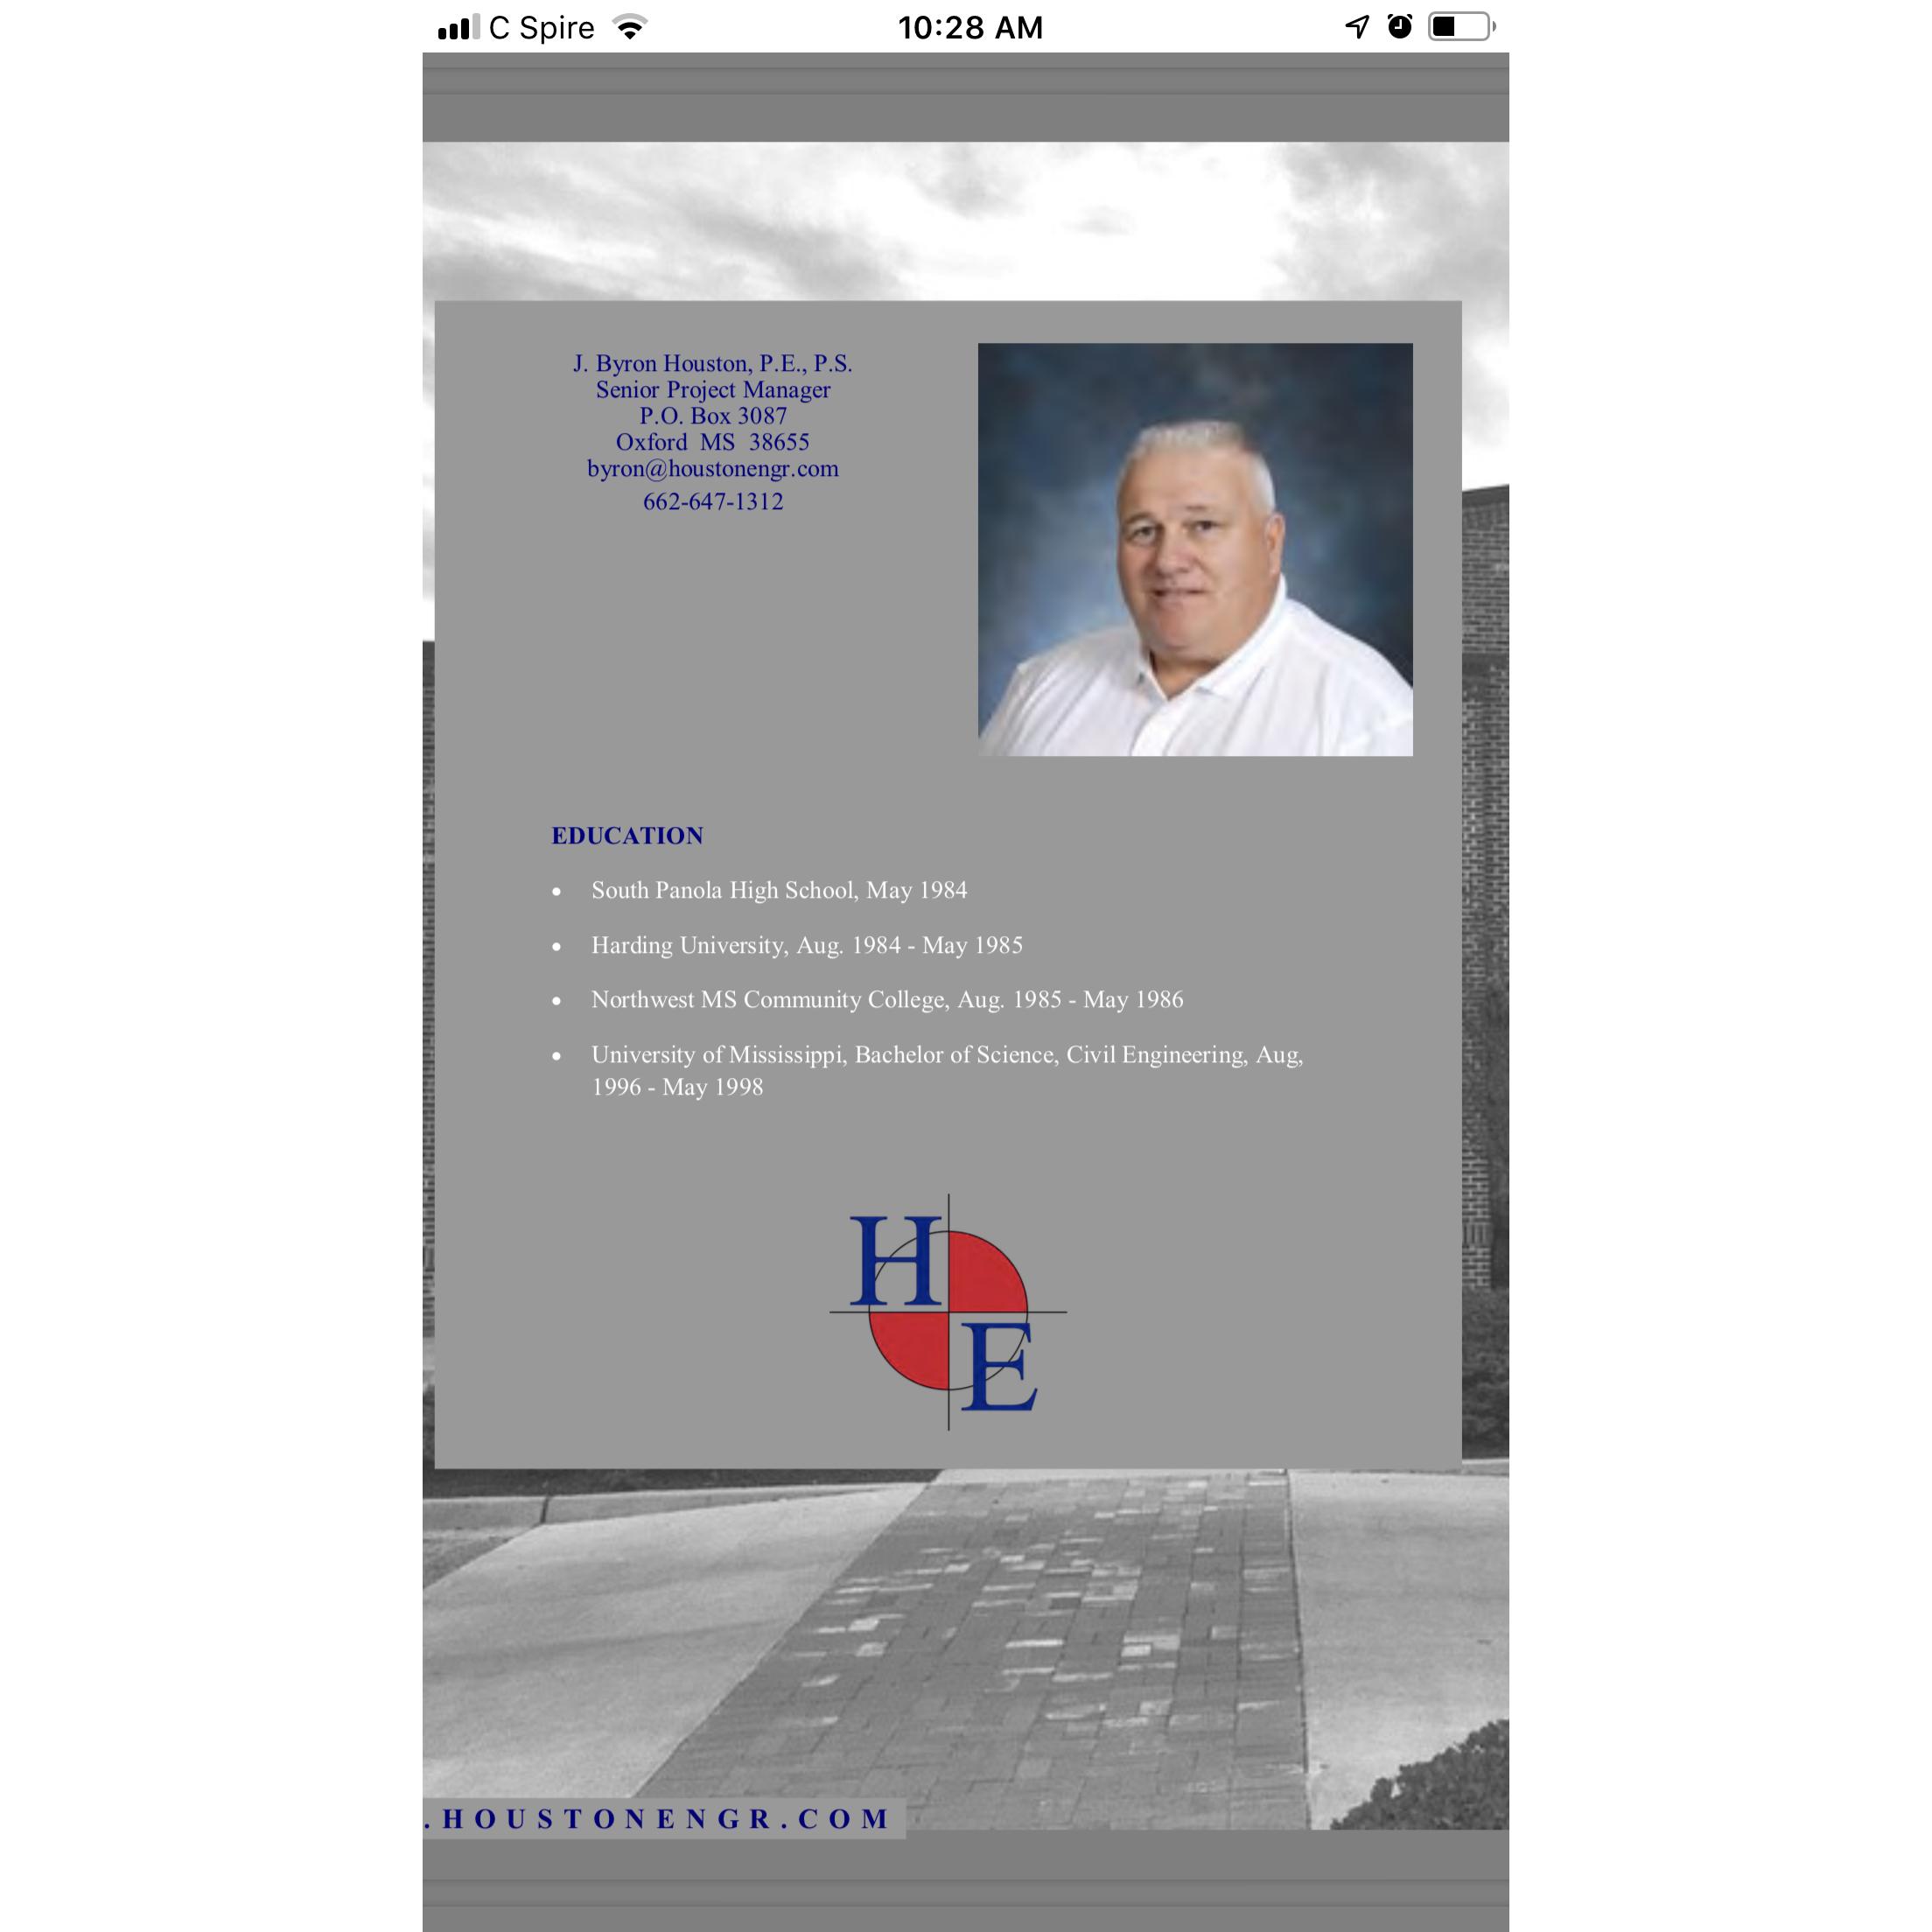 Houston Engineering, PLLC